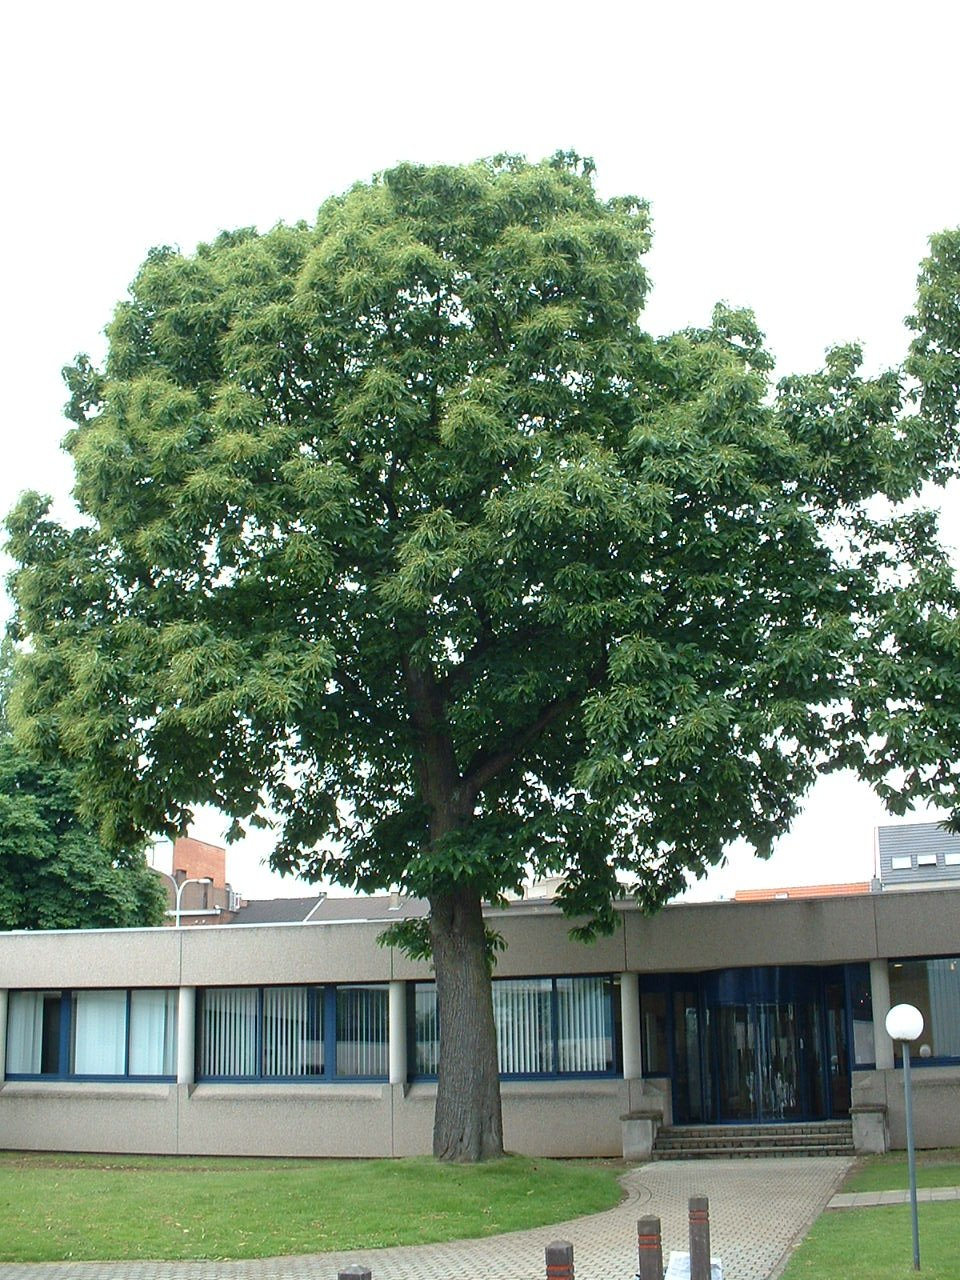 Tamme kastanje – Evere, Schiphollaan, 2 –  14 Juni 2002